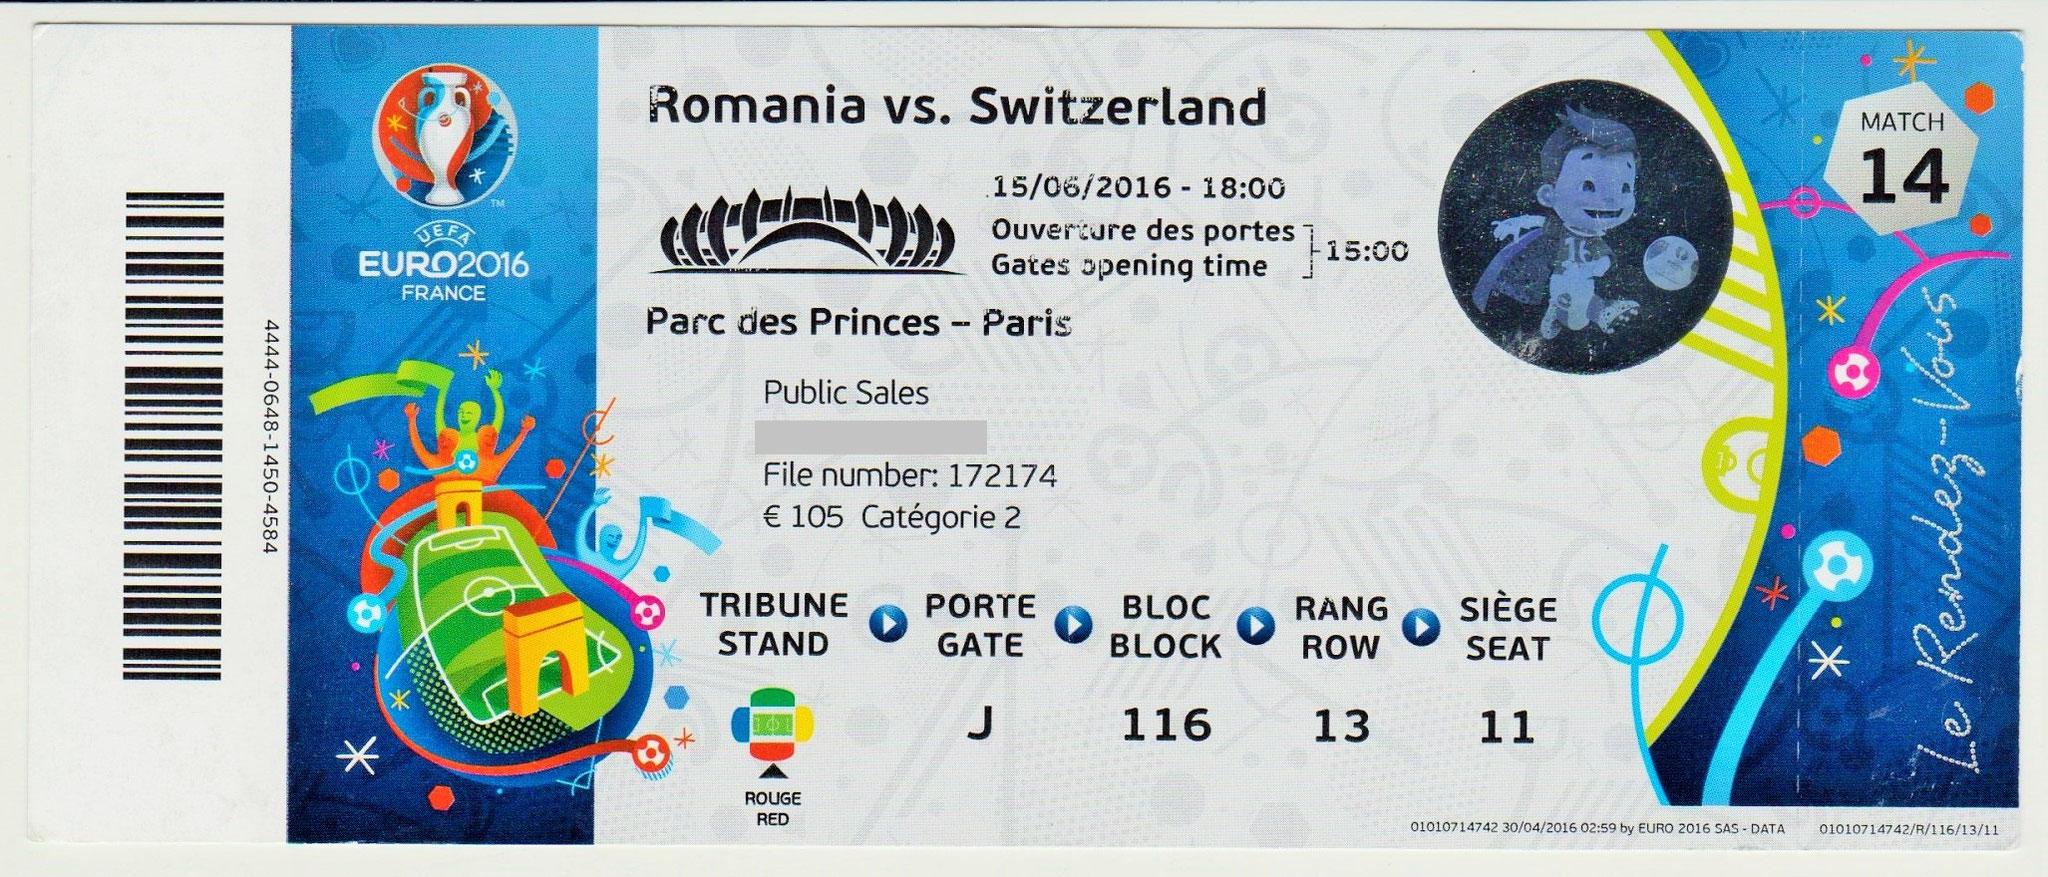 15/06/2016  Paris :  Roumanie 1 - 1  Suisse  > Stancu -sp- (Rou) -- Mehmedi (Sui) <